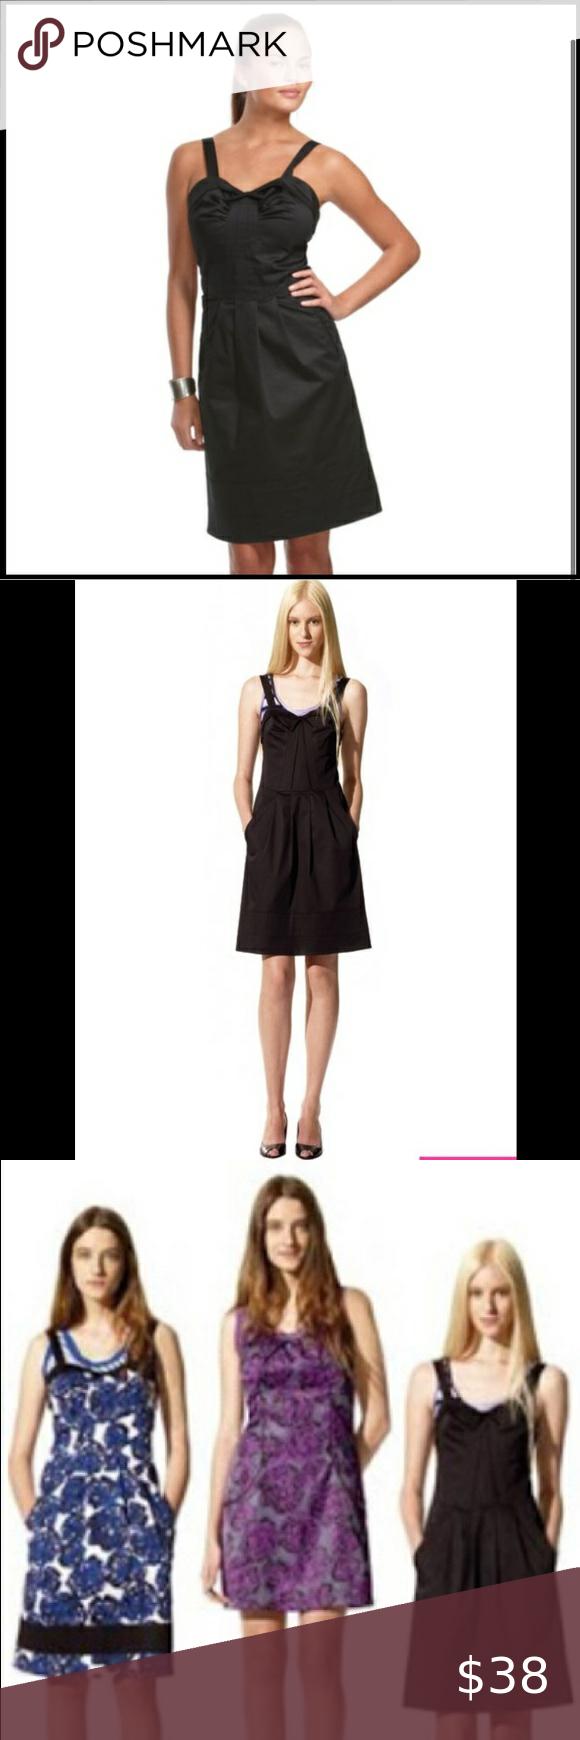 Little Black Dress By Richard Chai Sz 5 Little Black Dress Dresses Black Dress [ 1740 x 580 Pixel ]